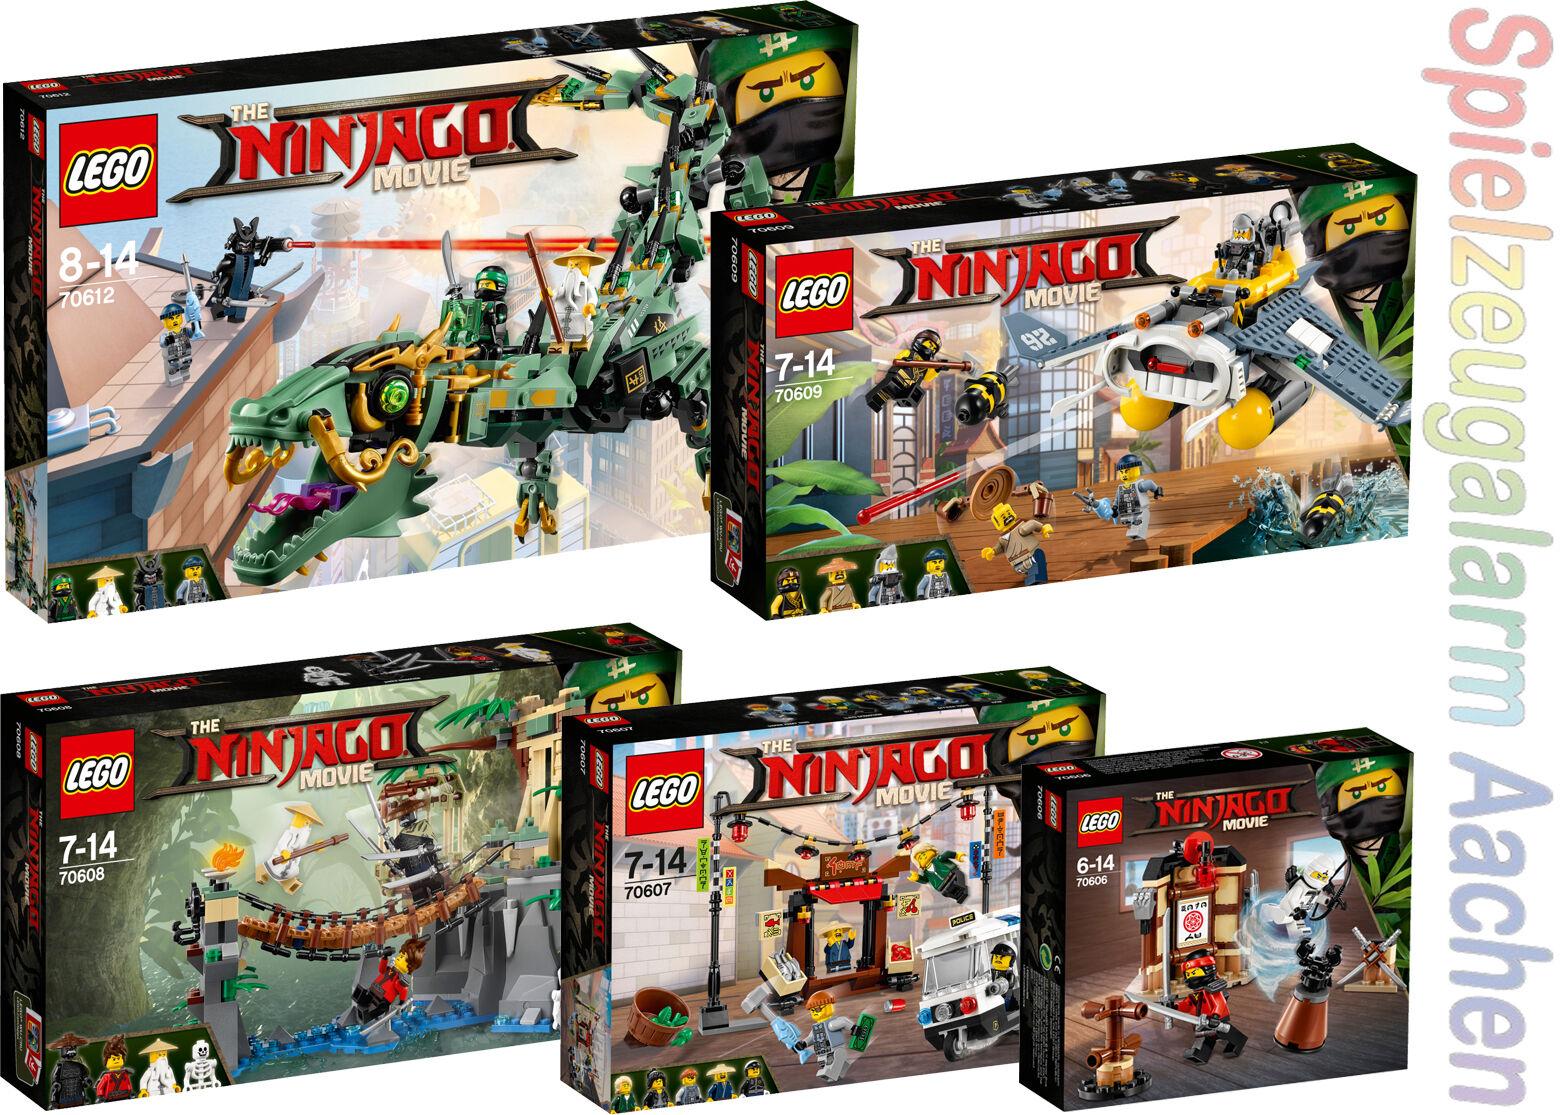 LEGO 3724  ISTRUZIONI DRAGO SET RARO LEGO Bauanleitungen LEGO Bau- & Konstruktionsspielzeug